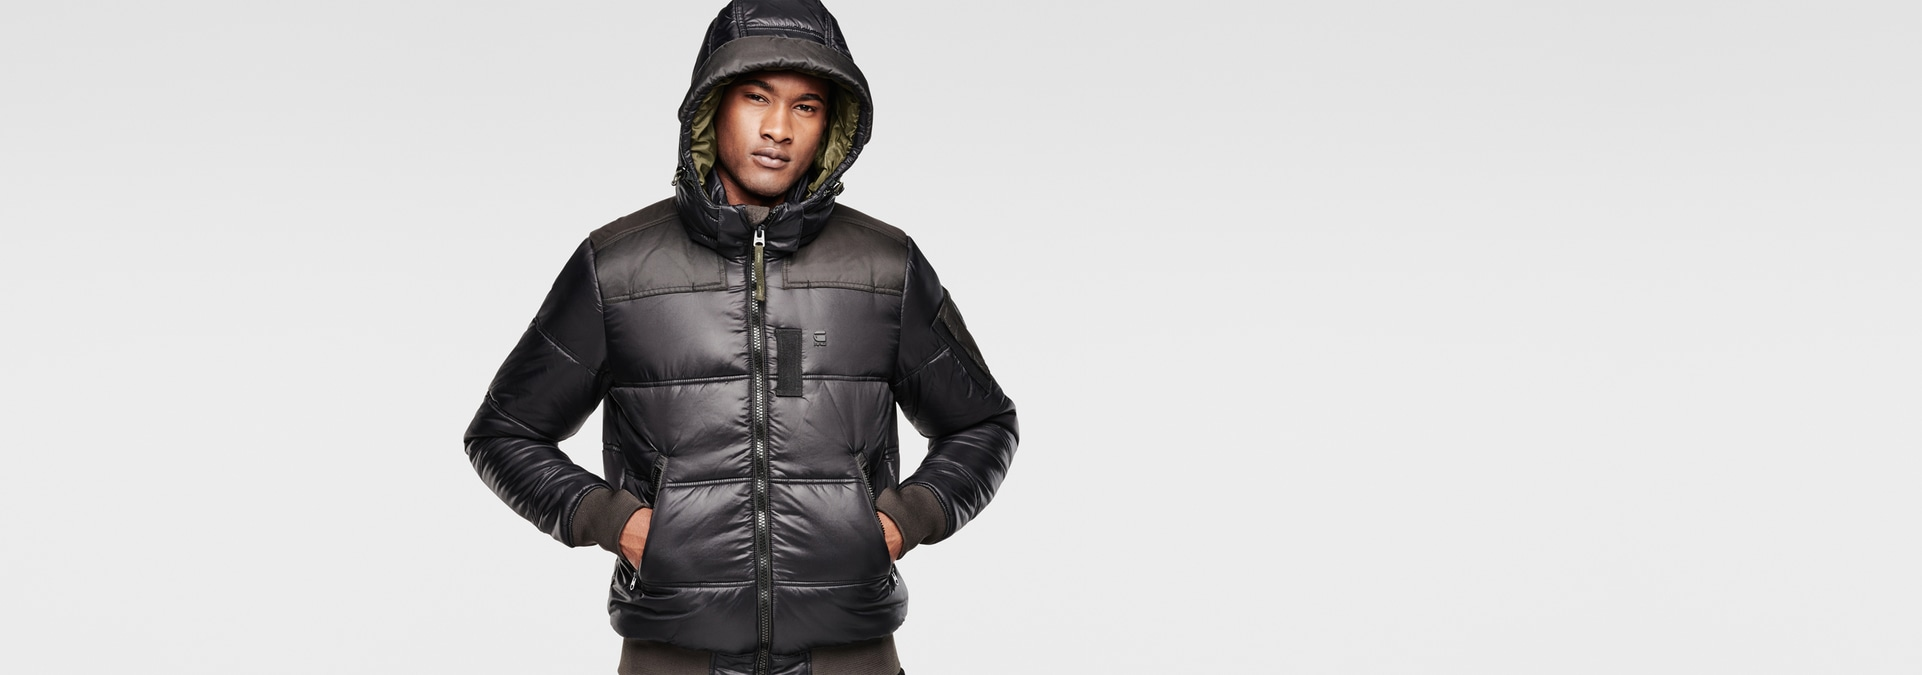 g star raw men winterjackets coats whistler hooded. Black Bedroom Furniture Sets. Home Design Ideas